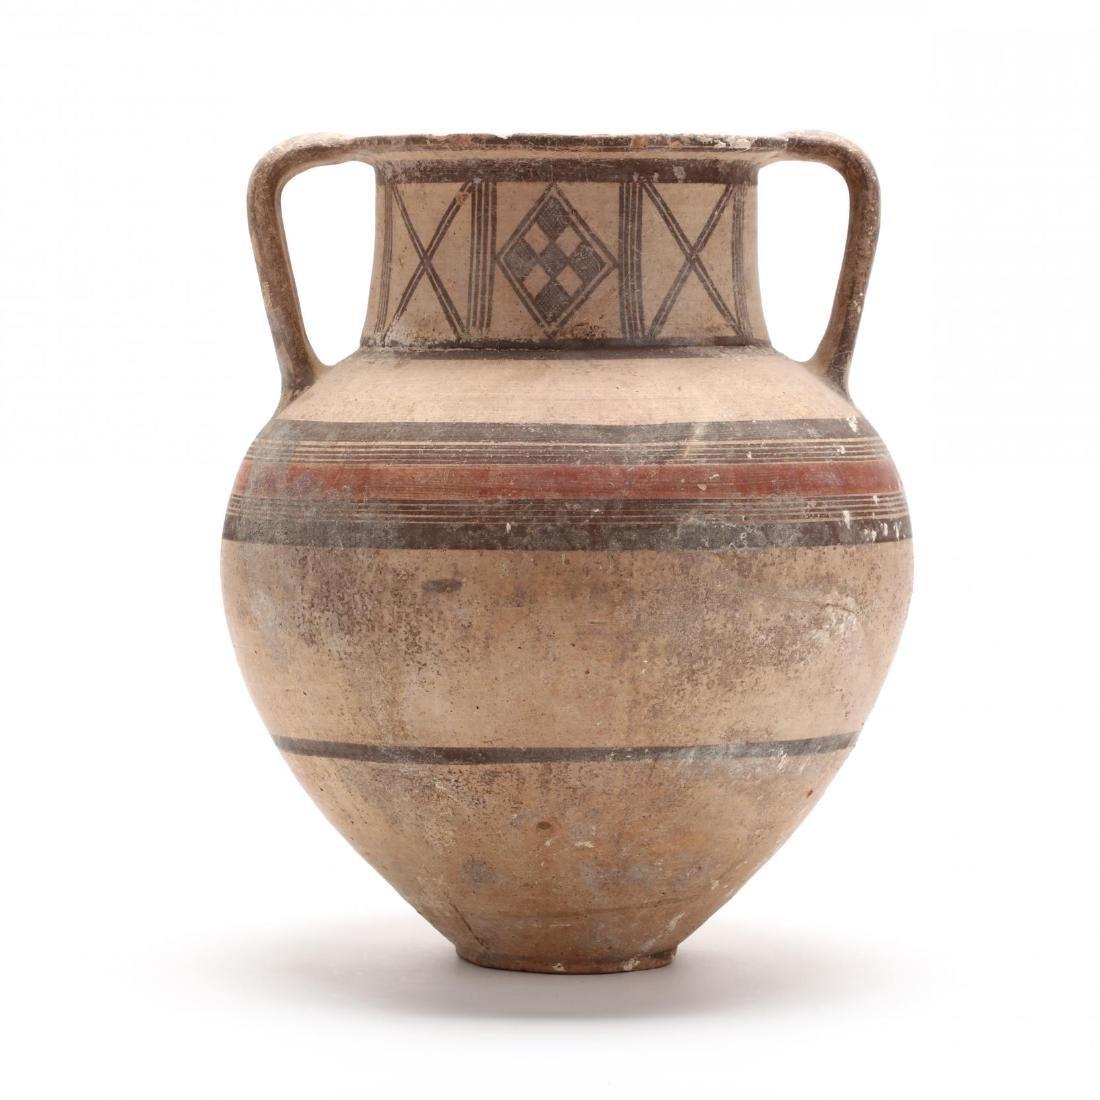 Cypro-Geometric Bichrome Amphora